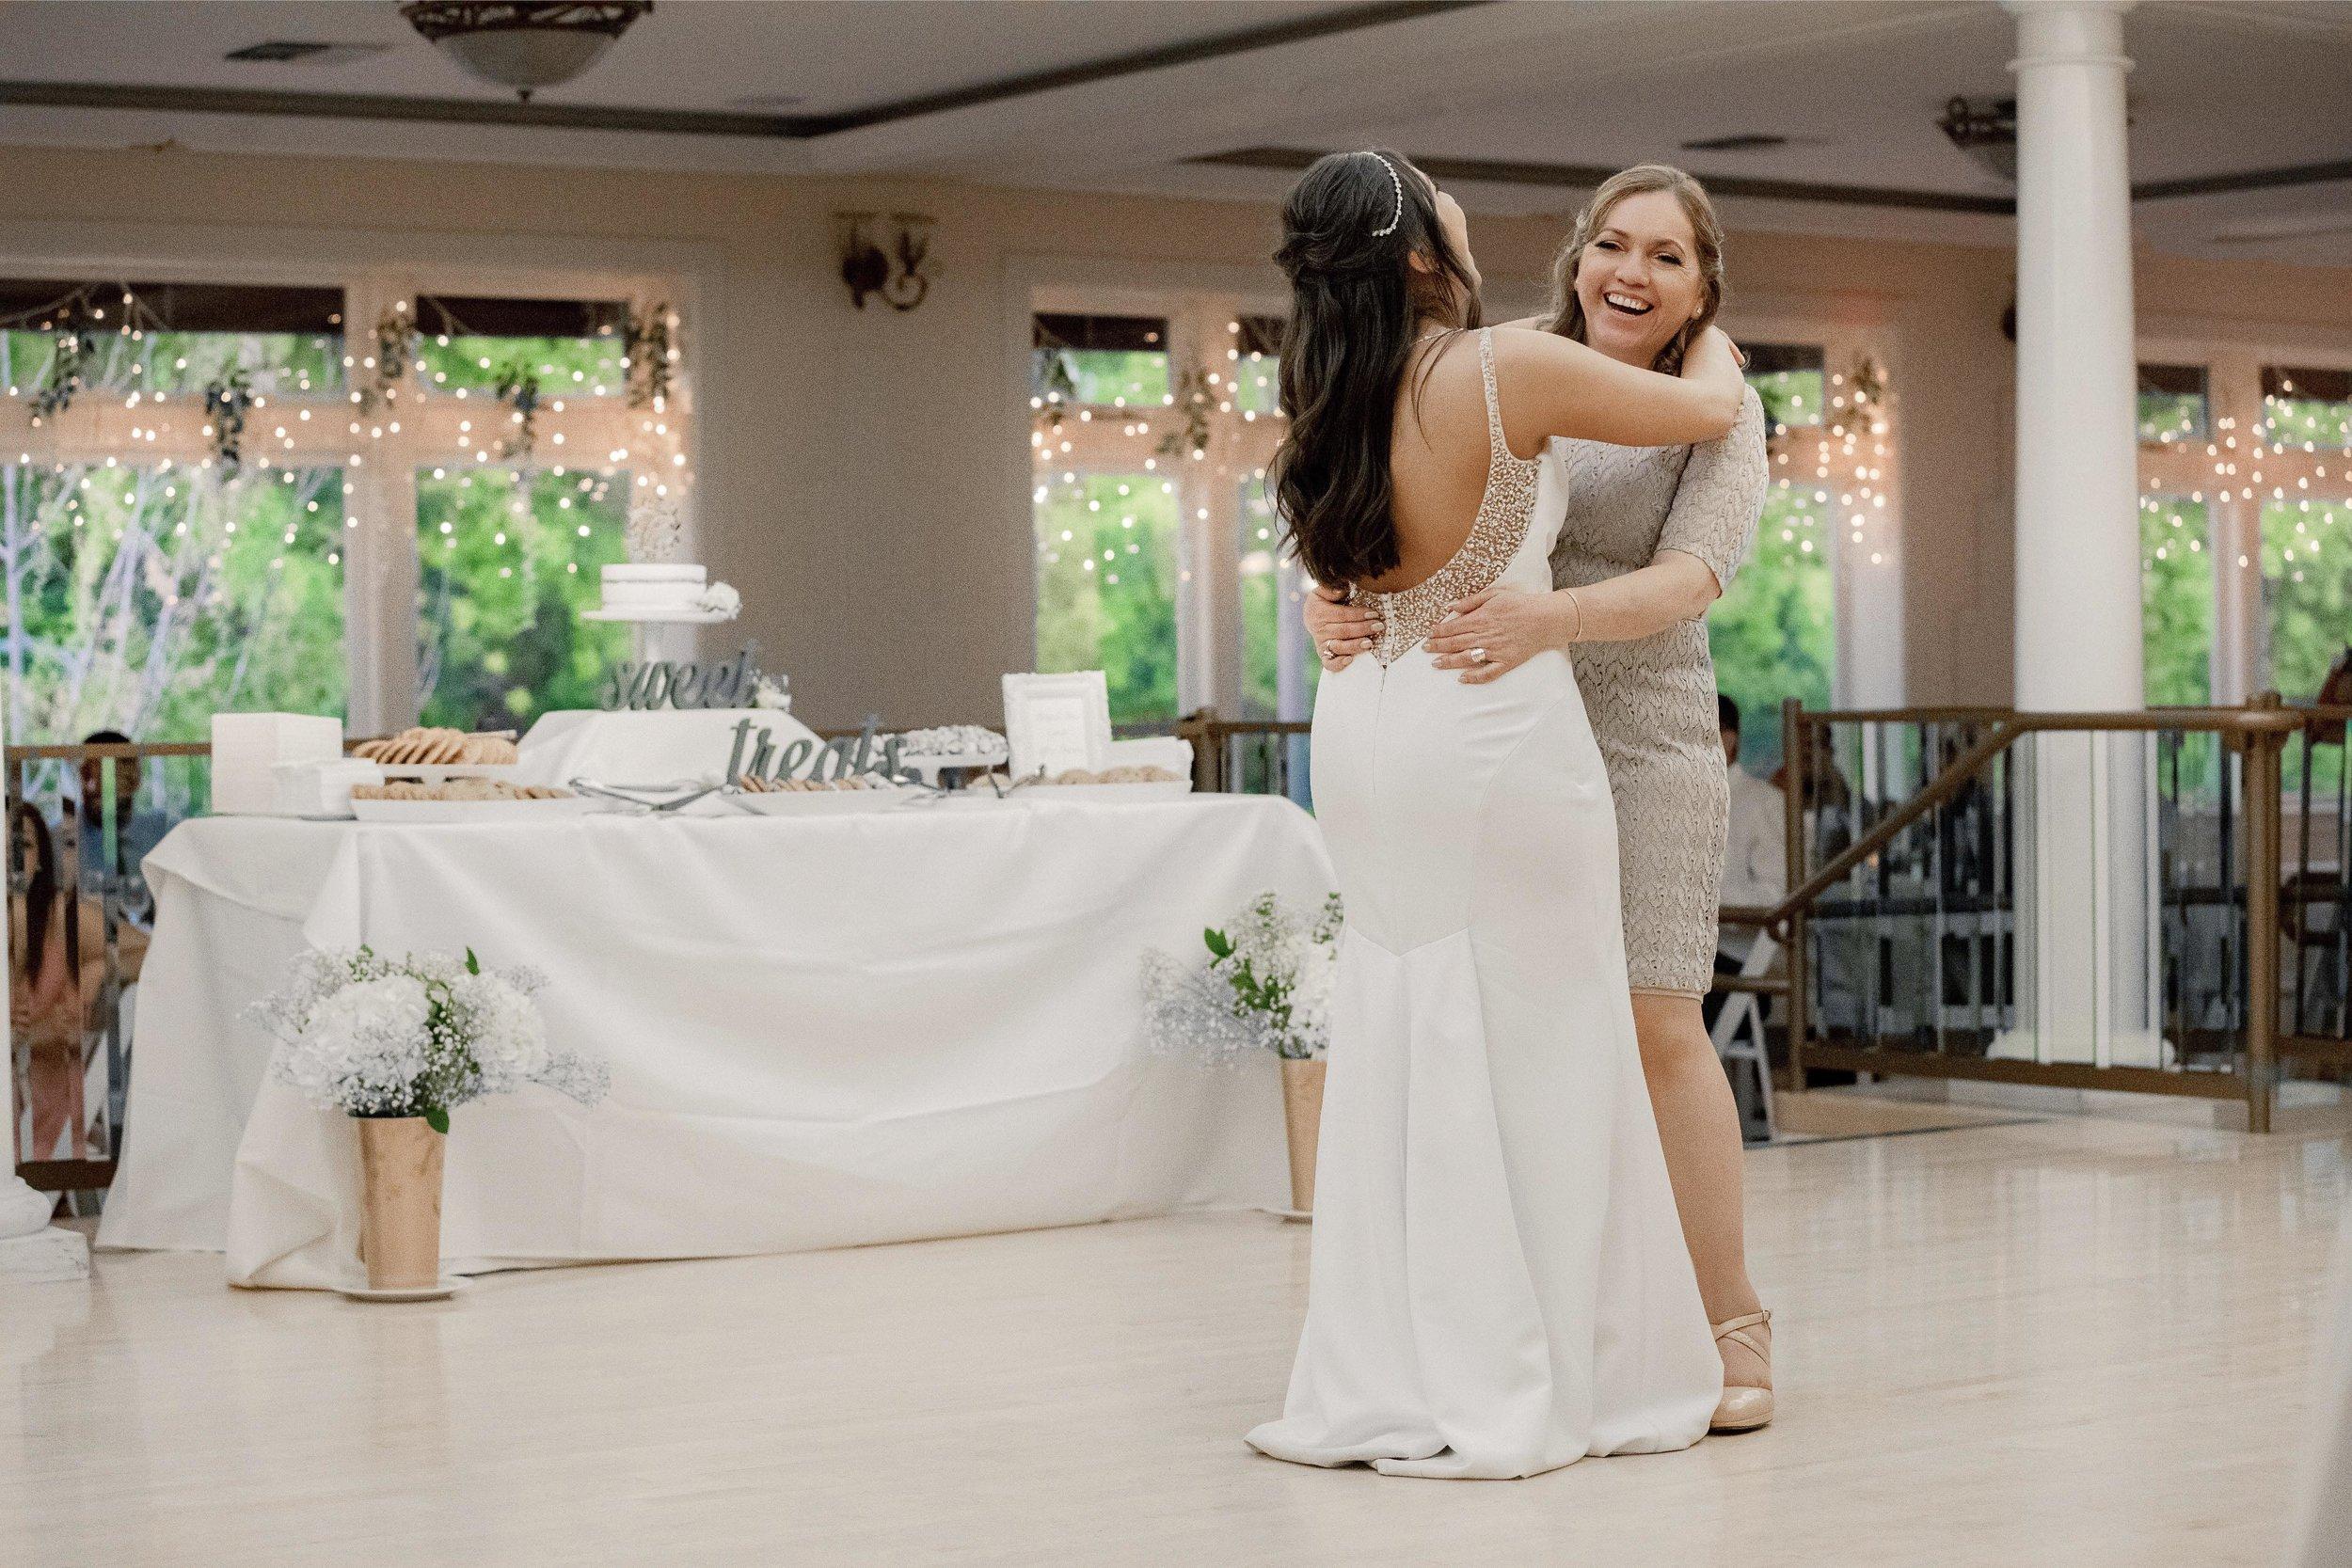 Chico Event Center Diamond Hotel Wedding Photography_48.jpg